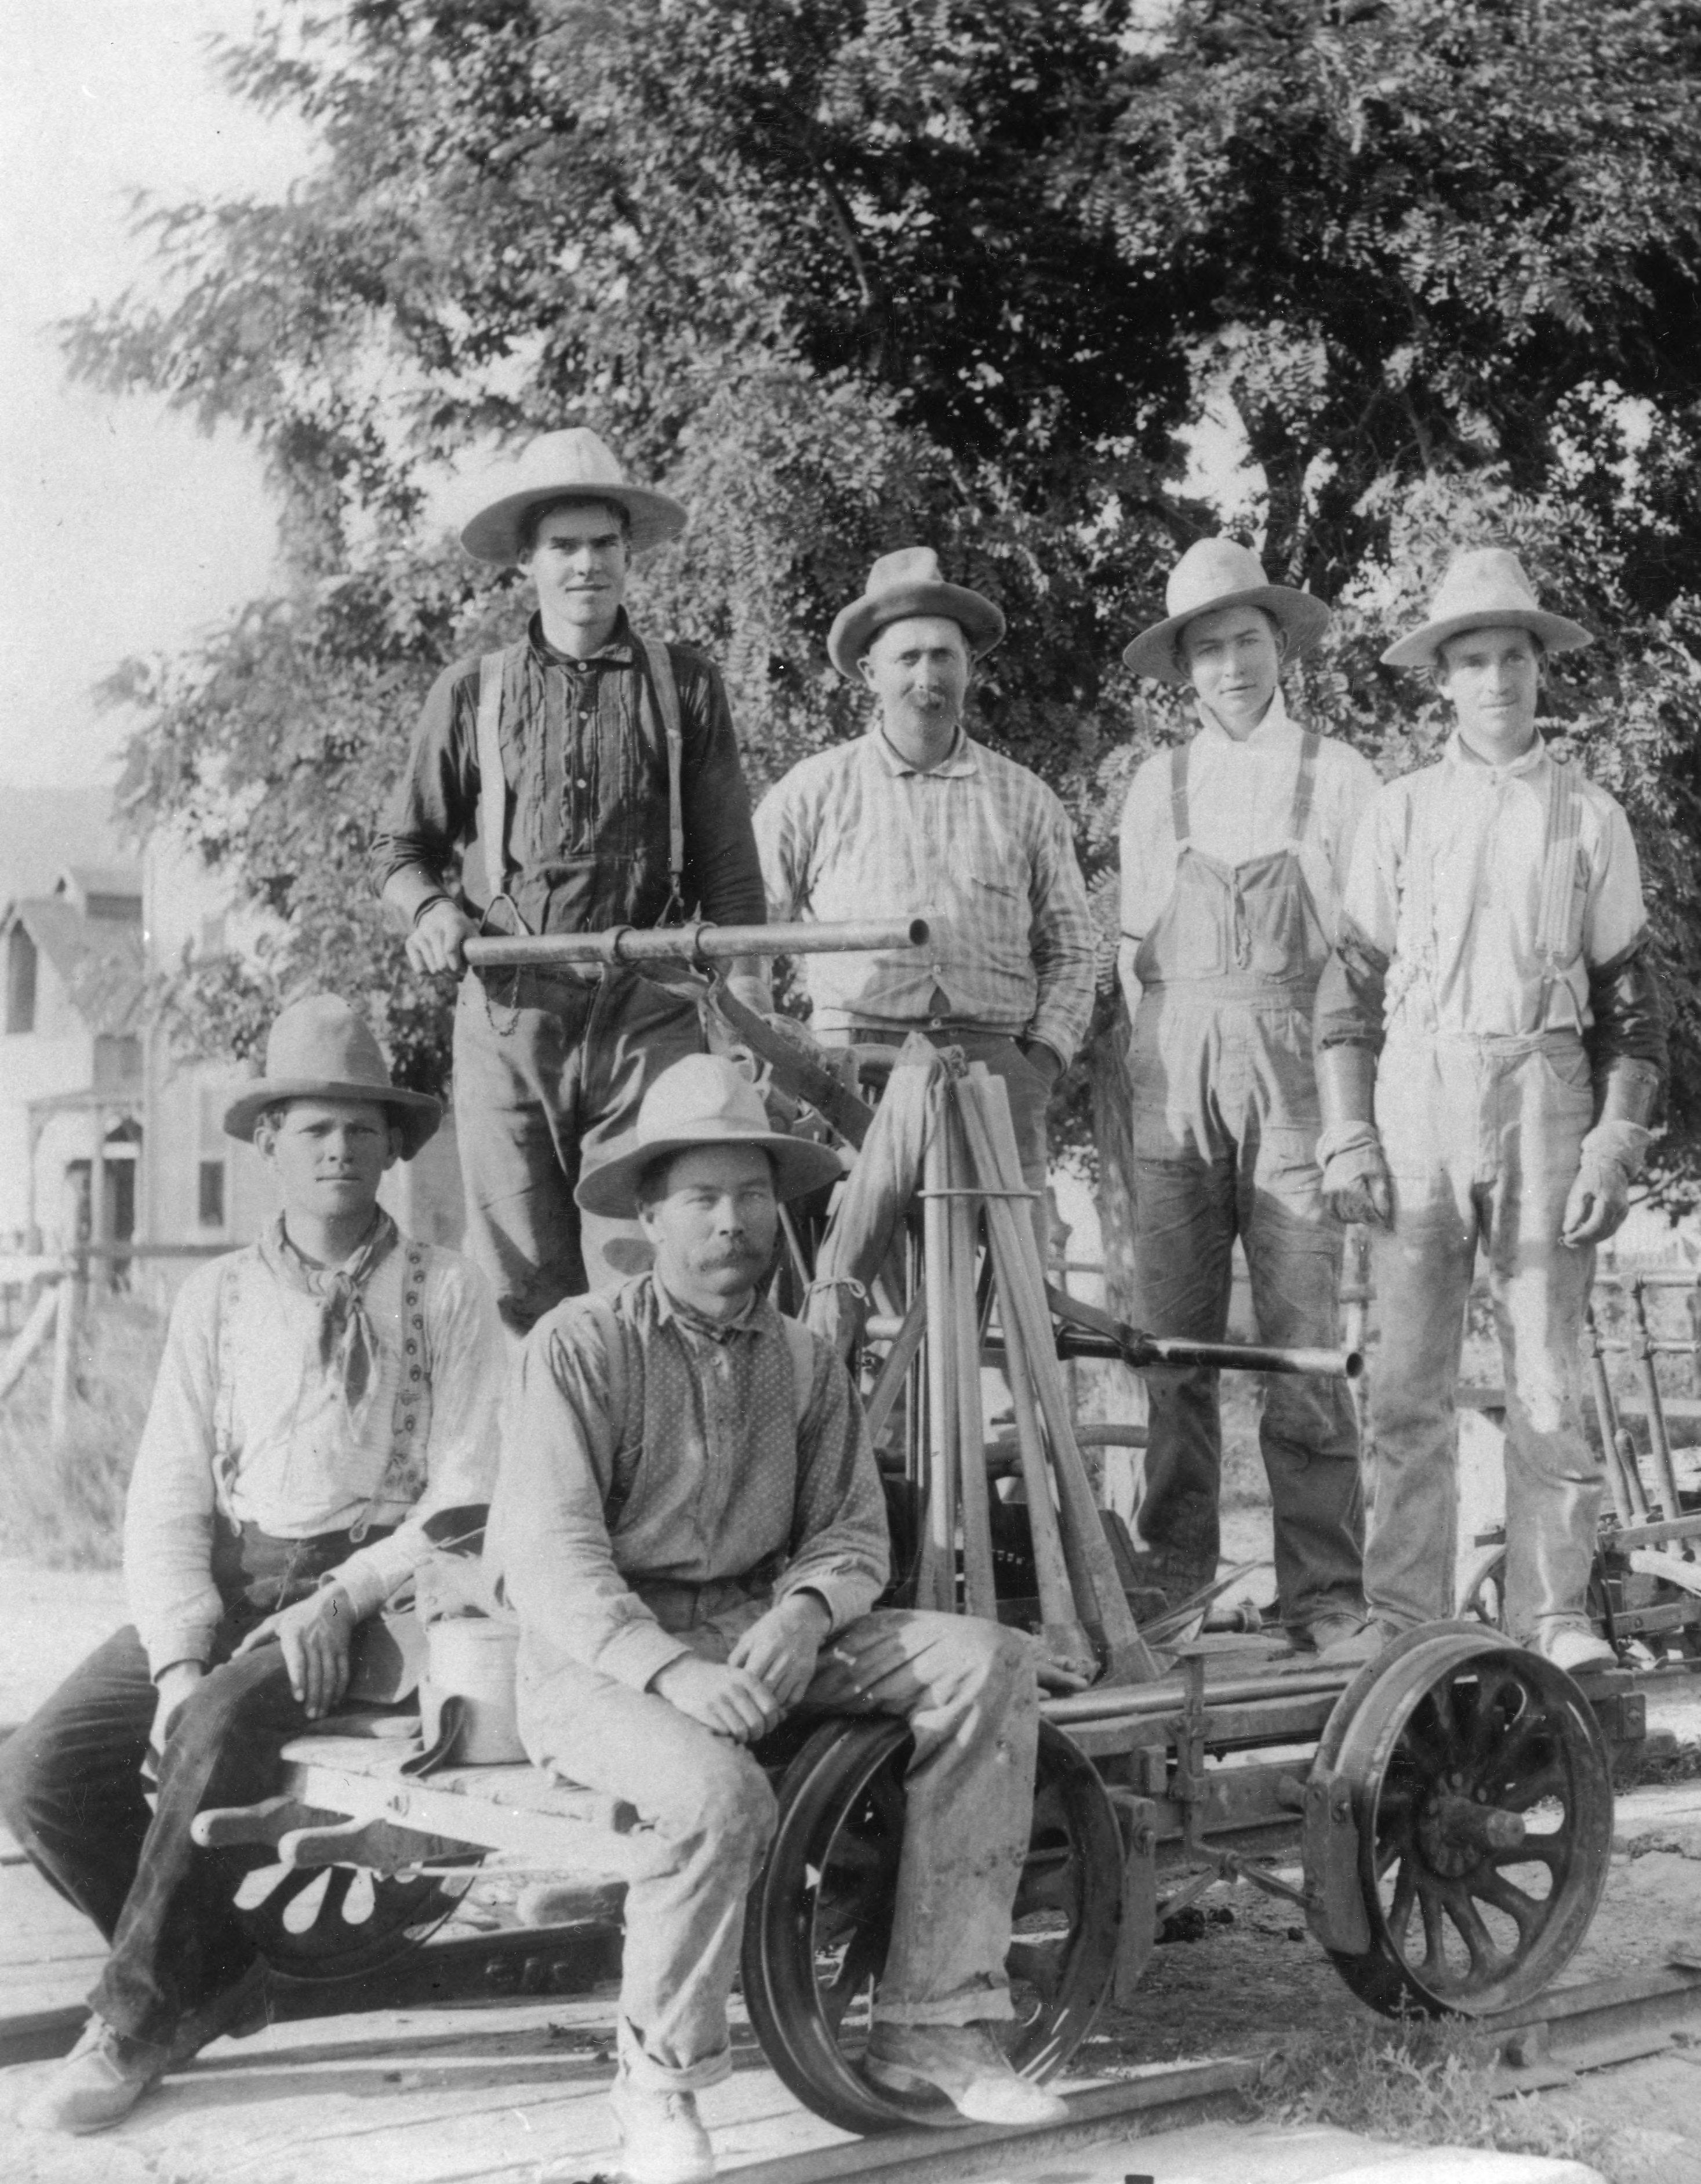 Railroad car and maintenance crew.